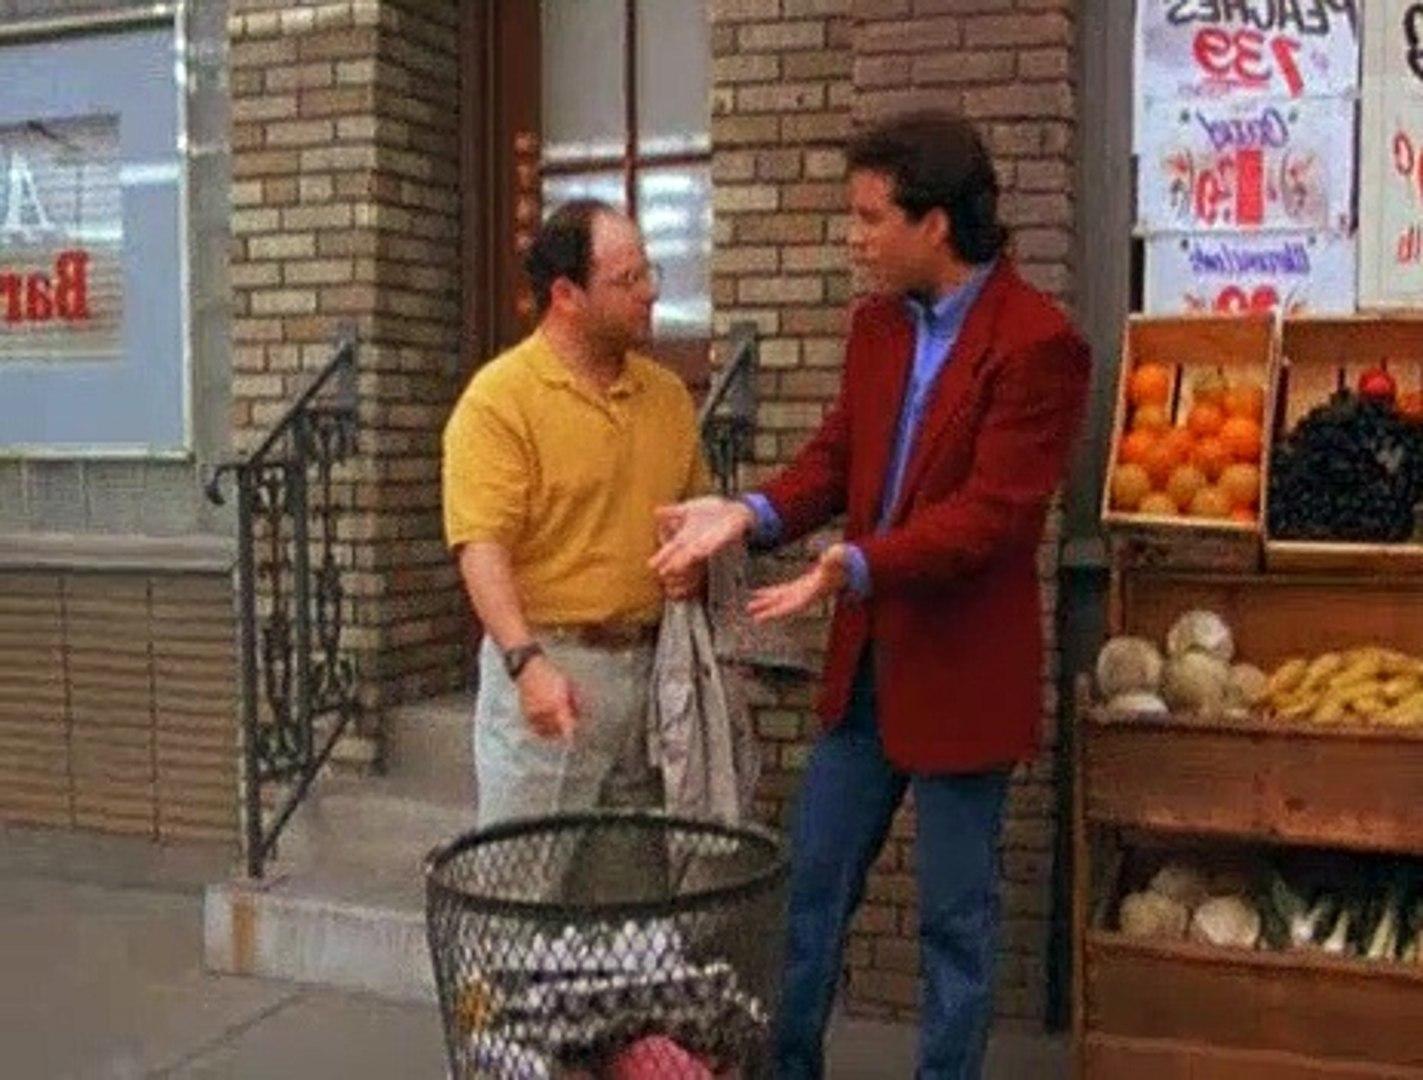 Seinfeld S04E06 - The Watch